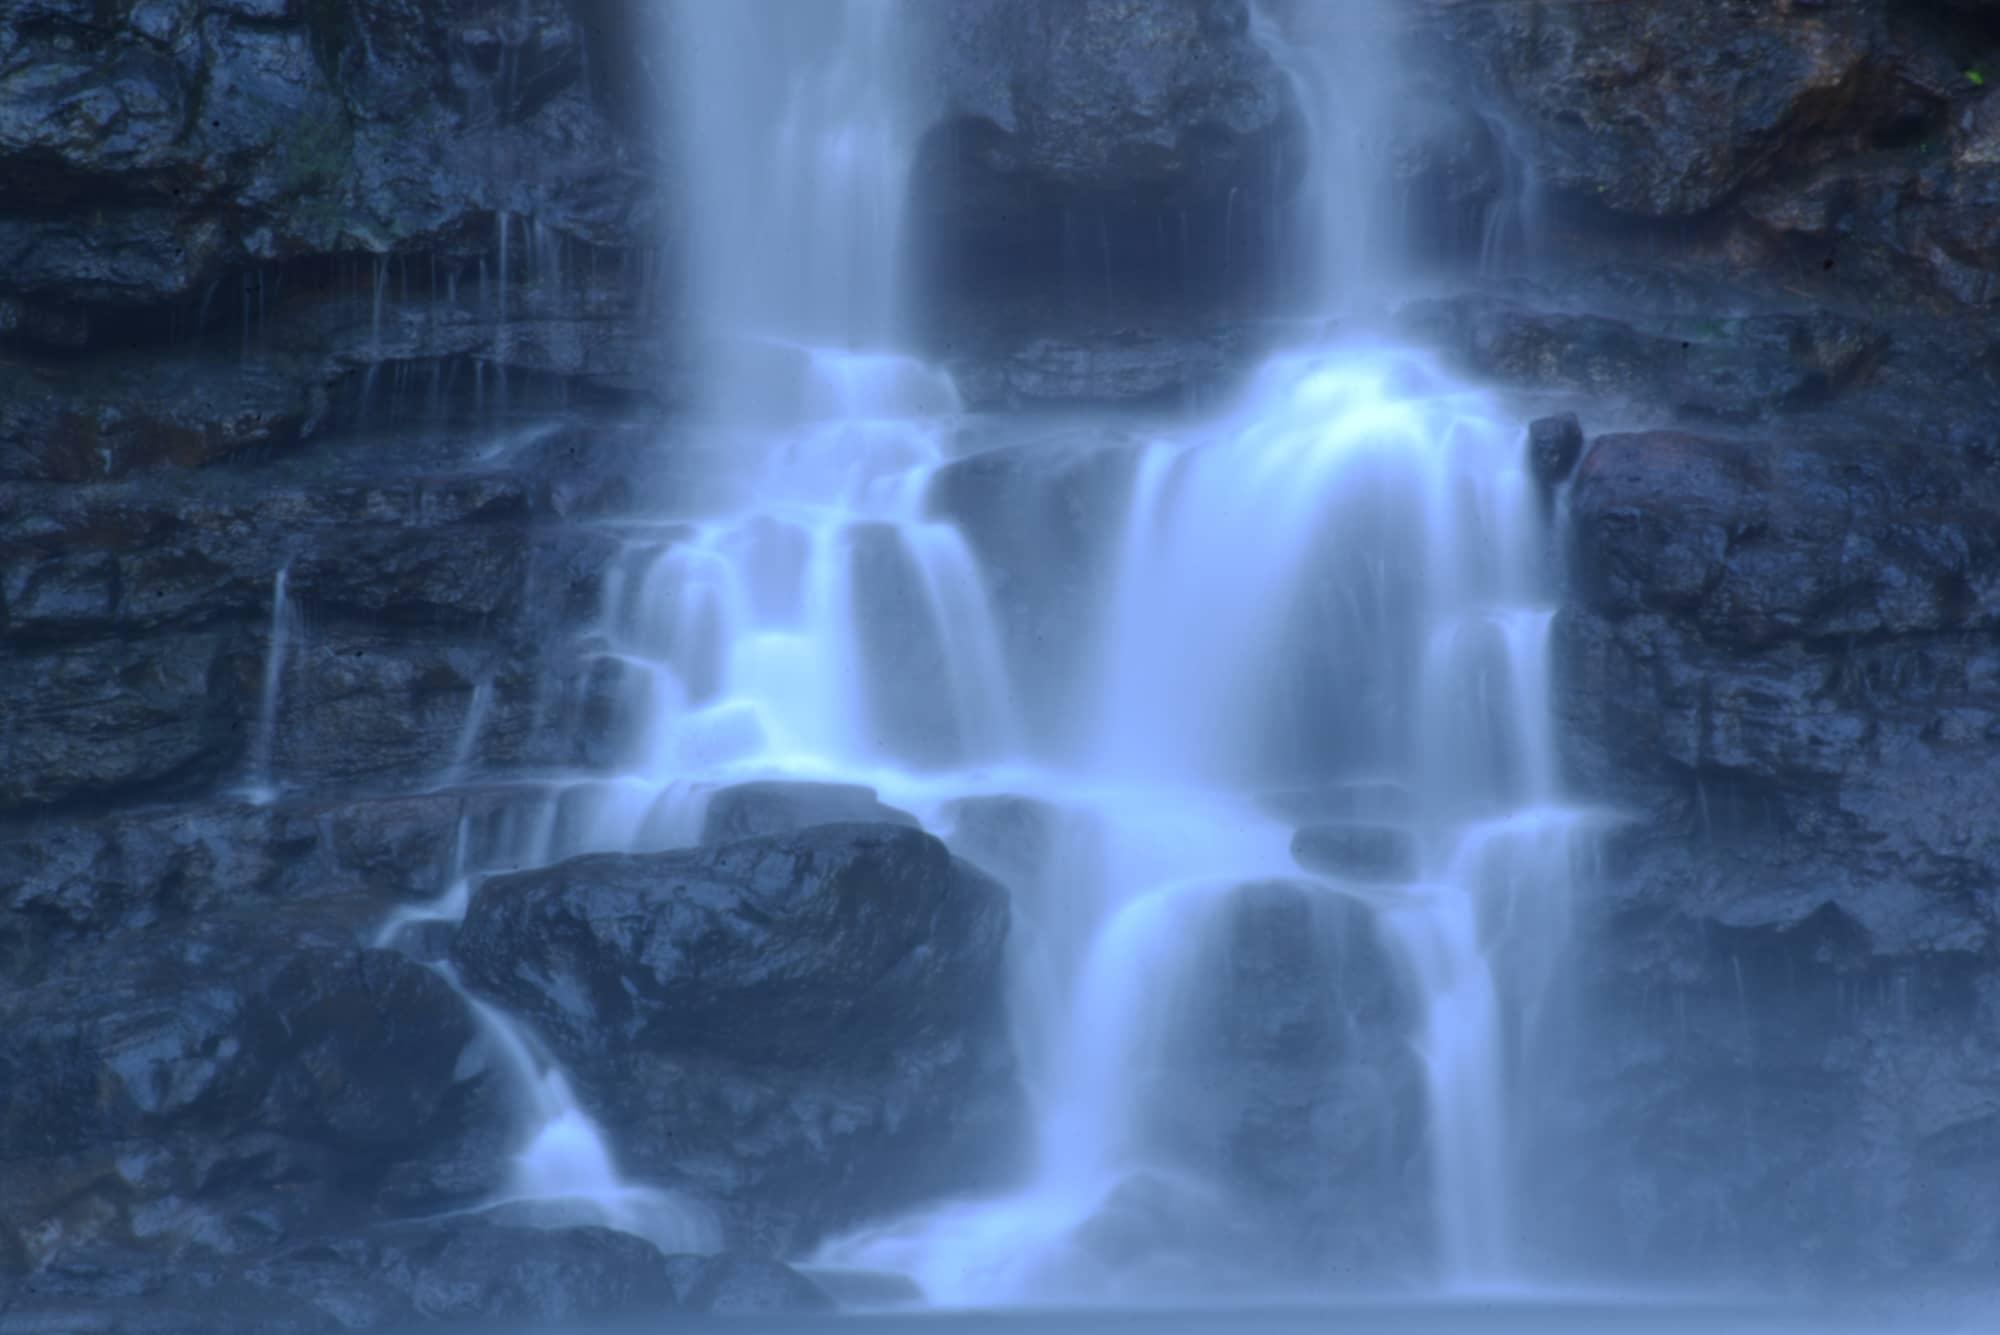 Photograph of a waterfall by Kaoru Coakley